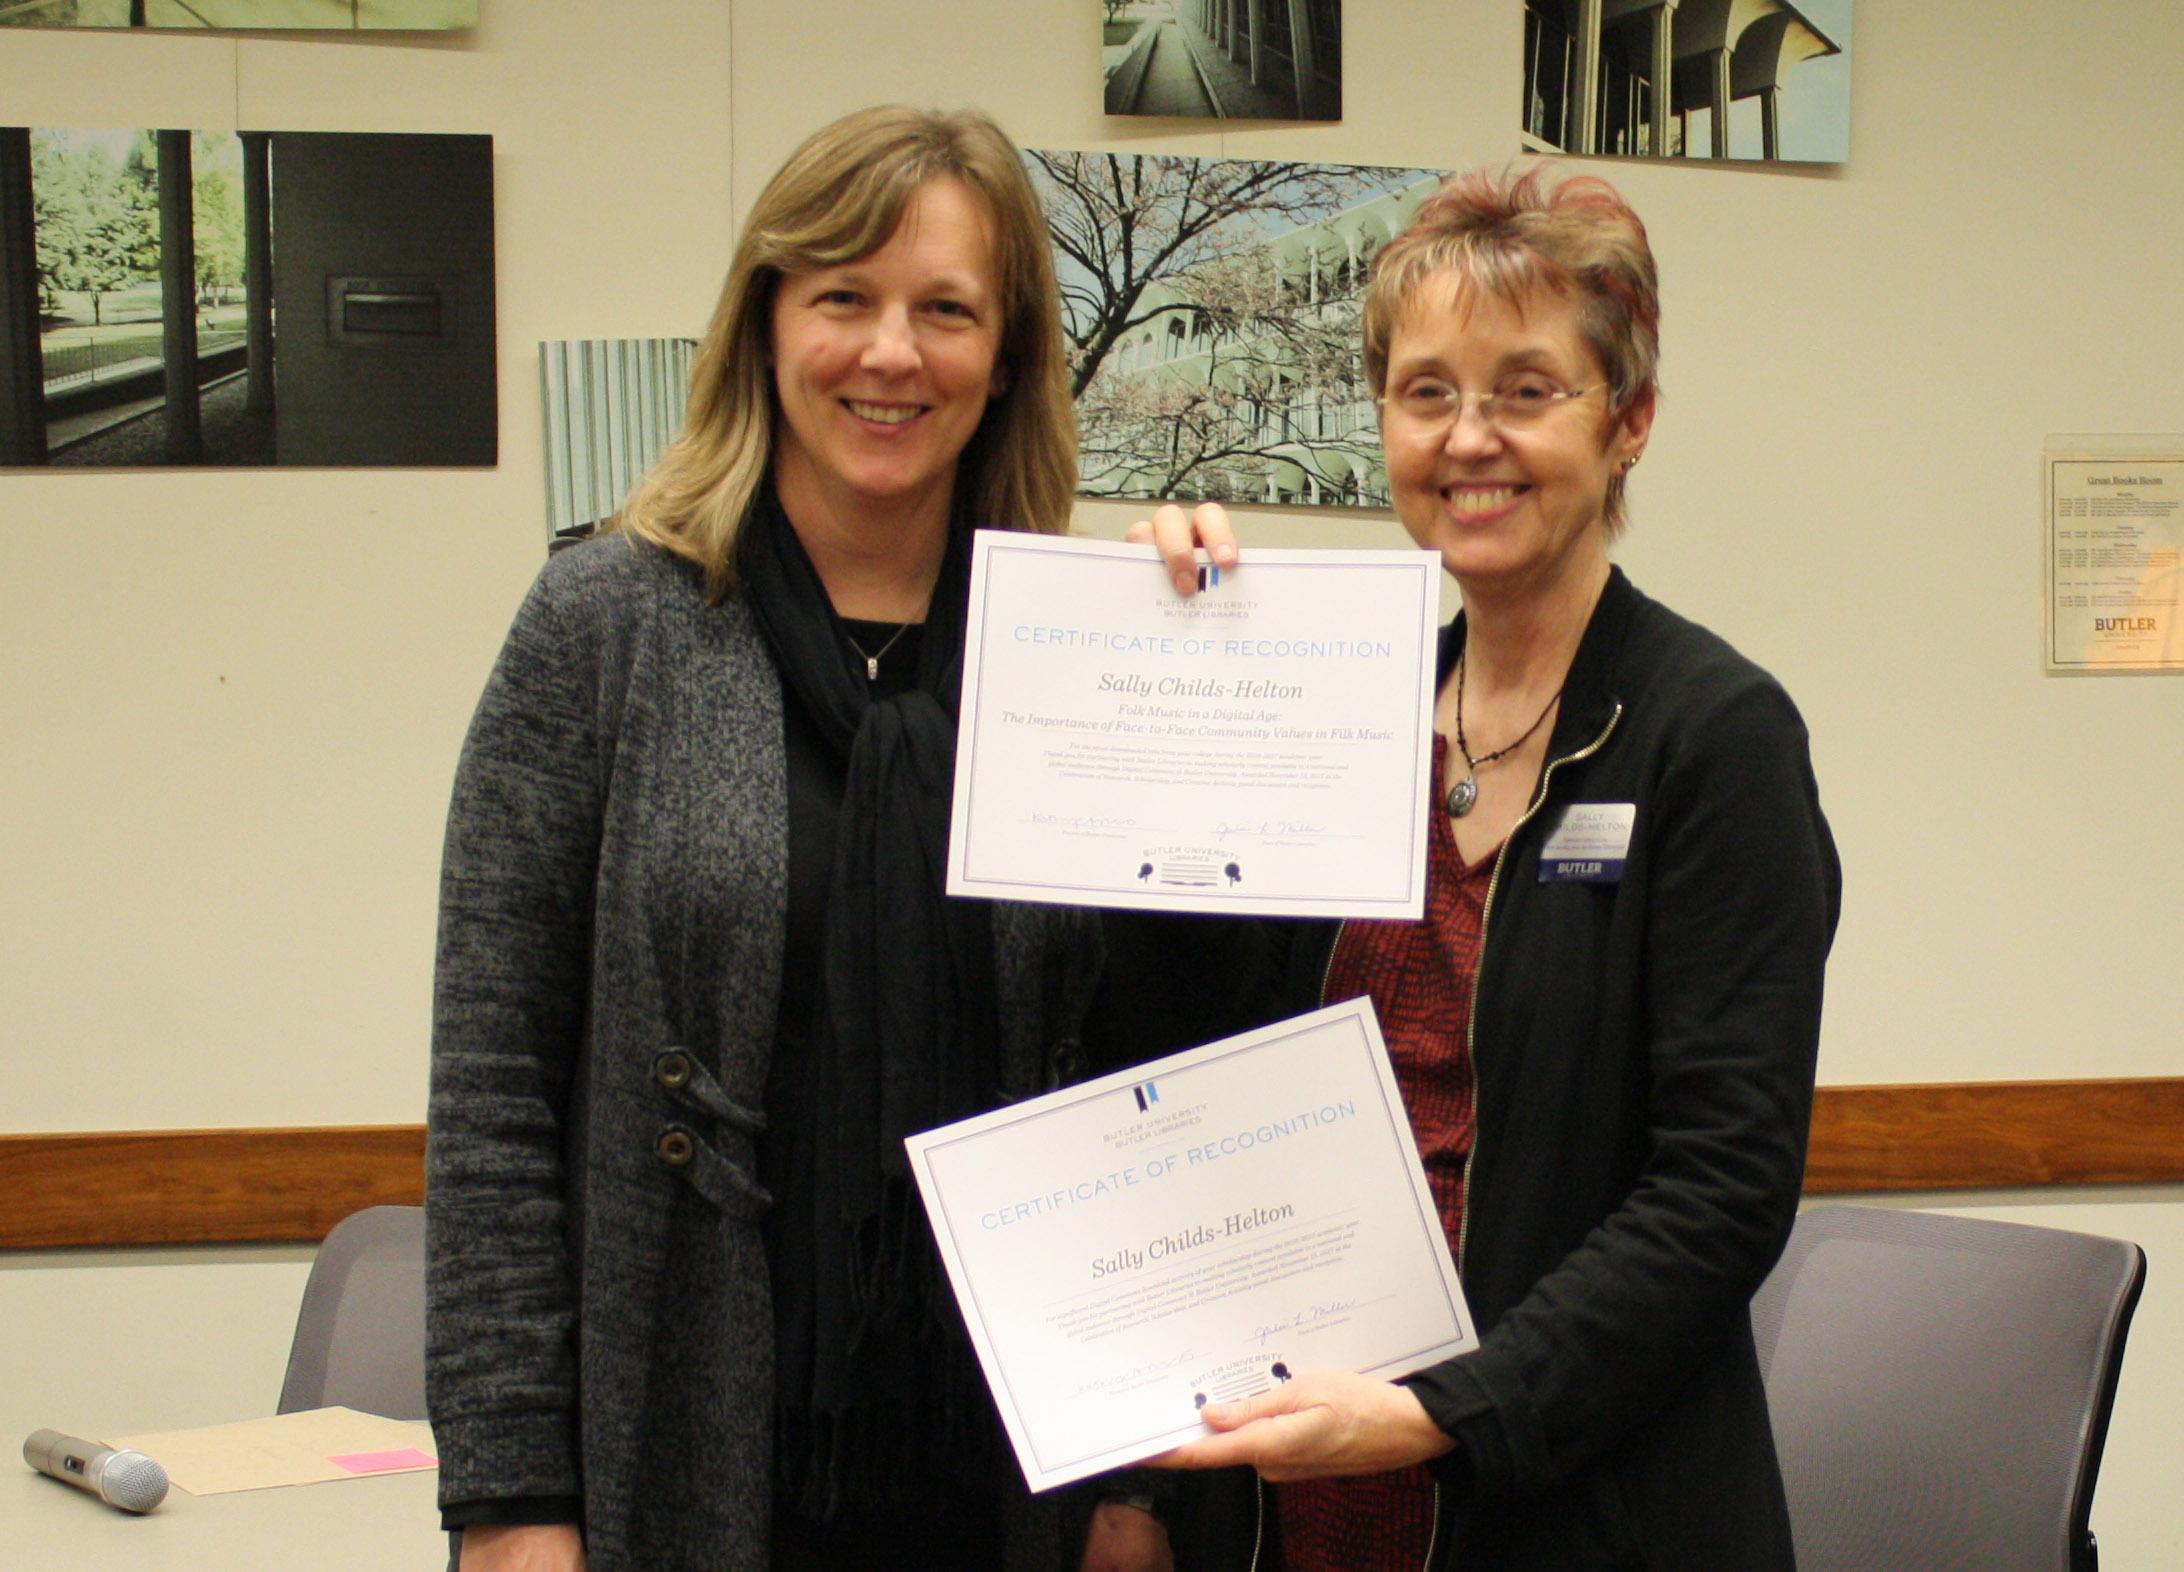 Celebration Certificate Recipients - Libraru faculty